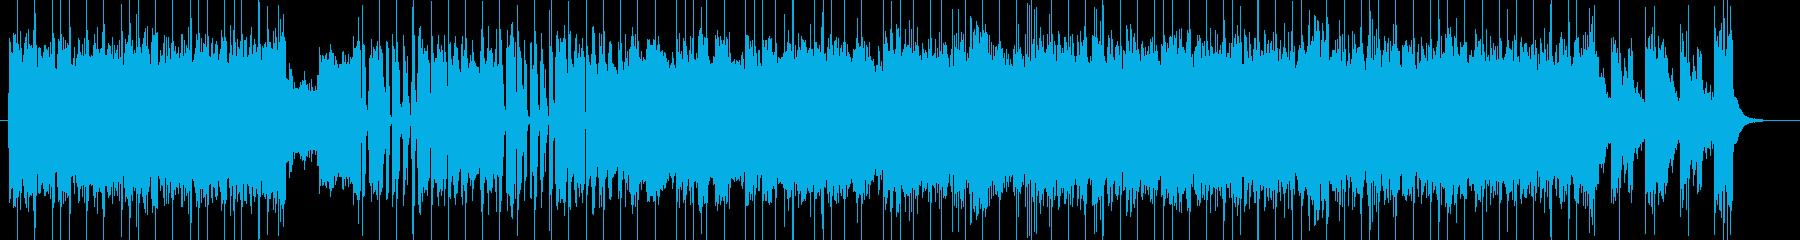 「HR/HM」「DARK系」BGM11の再生済みの波形